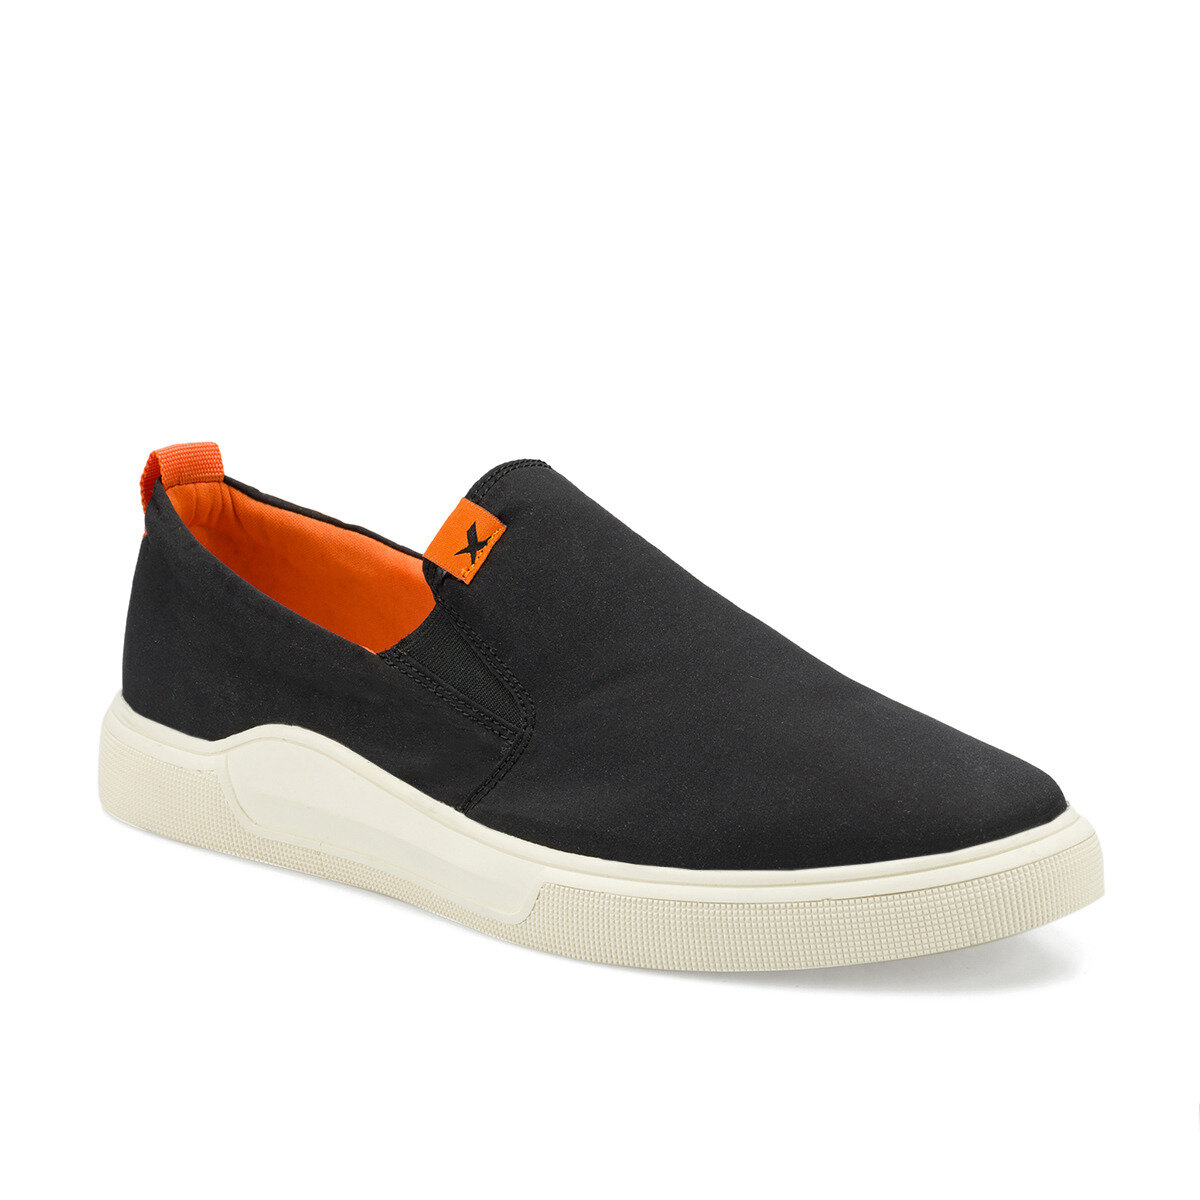 FLO Moccasins Men Loafers Black Navy Brand Fashion Summer Style Soft  High Quality Men Flats Driving Shoes Slip On Shoes KINETIX MERDA